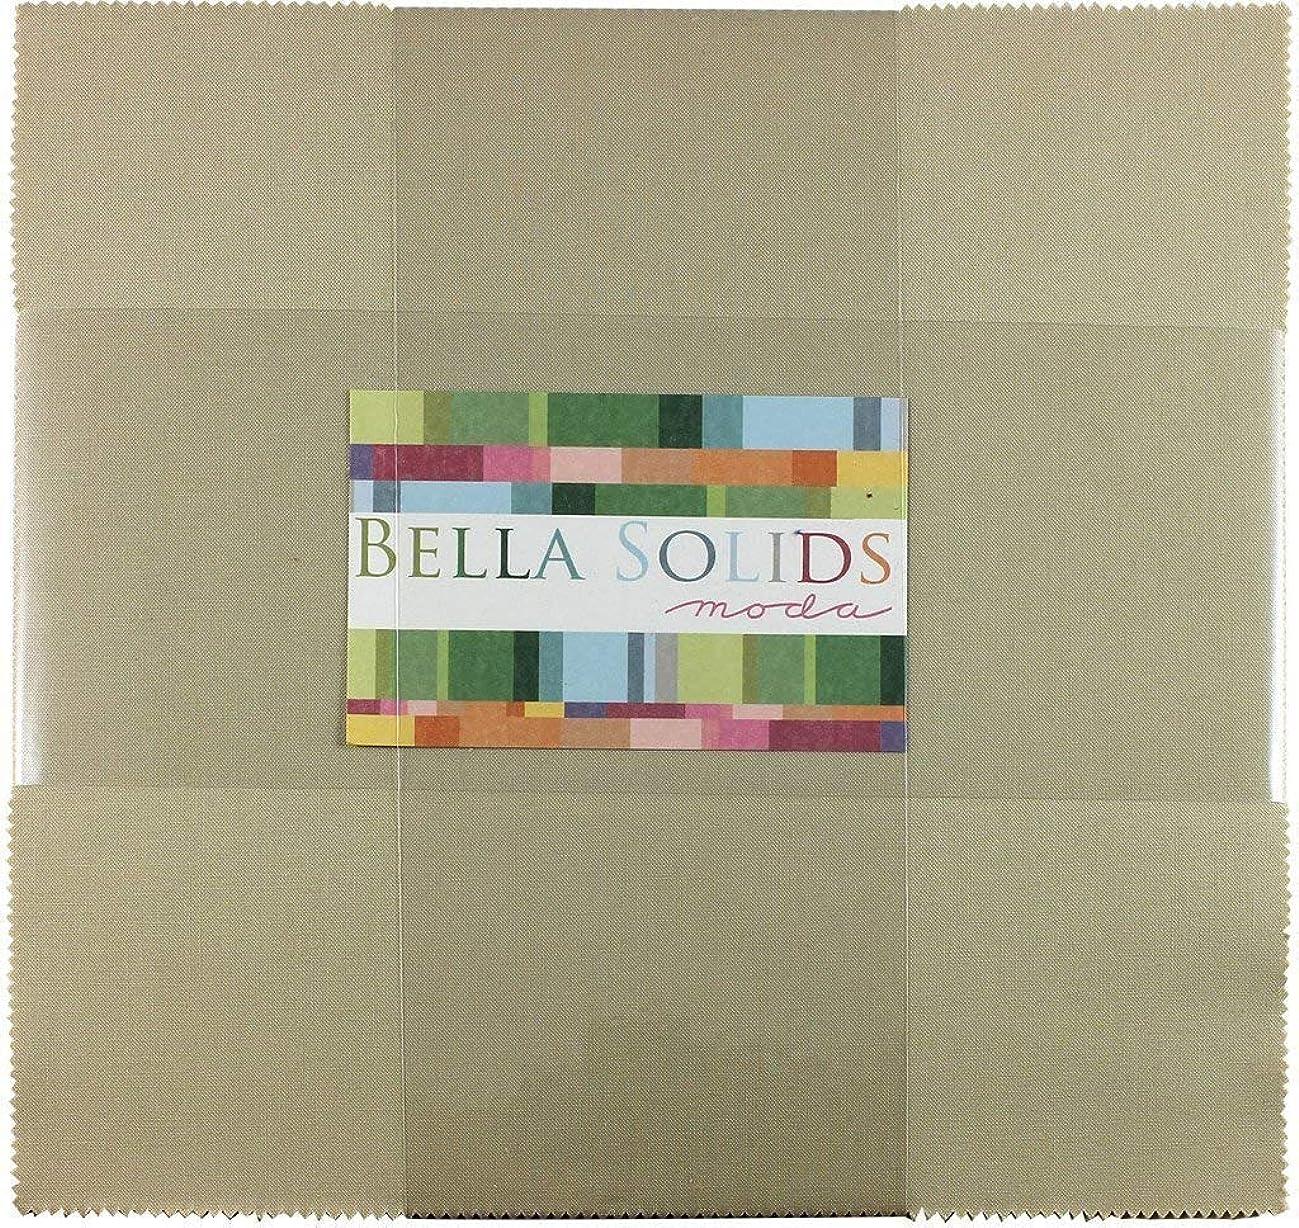 Bella Solids Parchment Jr Layer Cake (9900JLC 39) by Moda House Designer for Moda